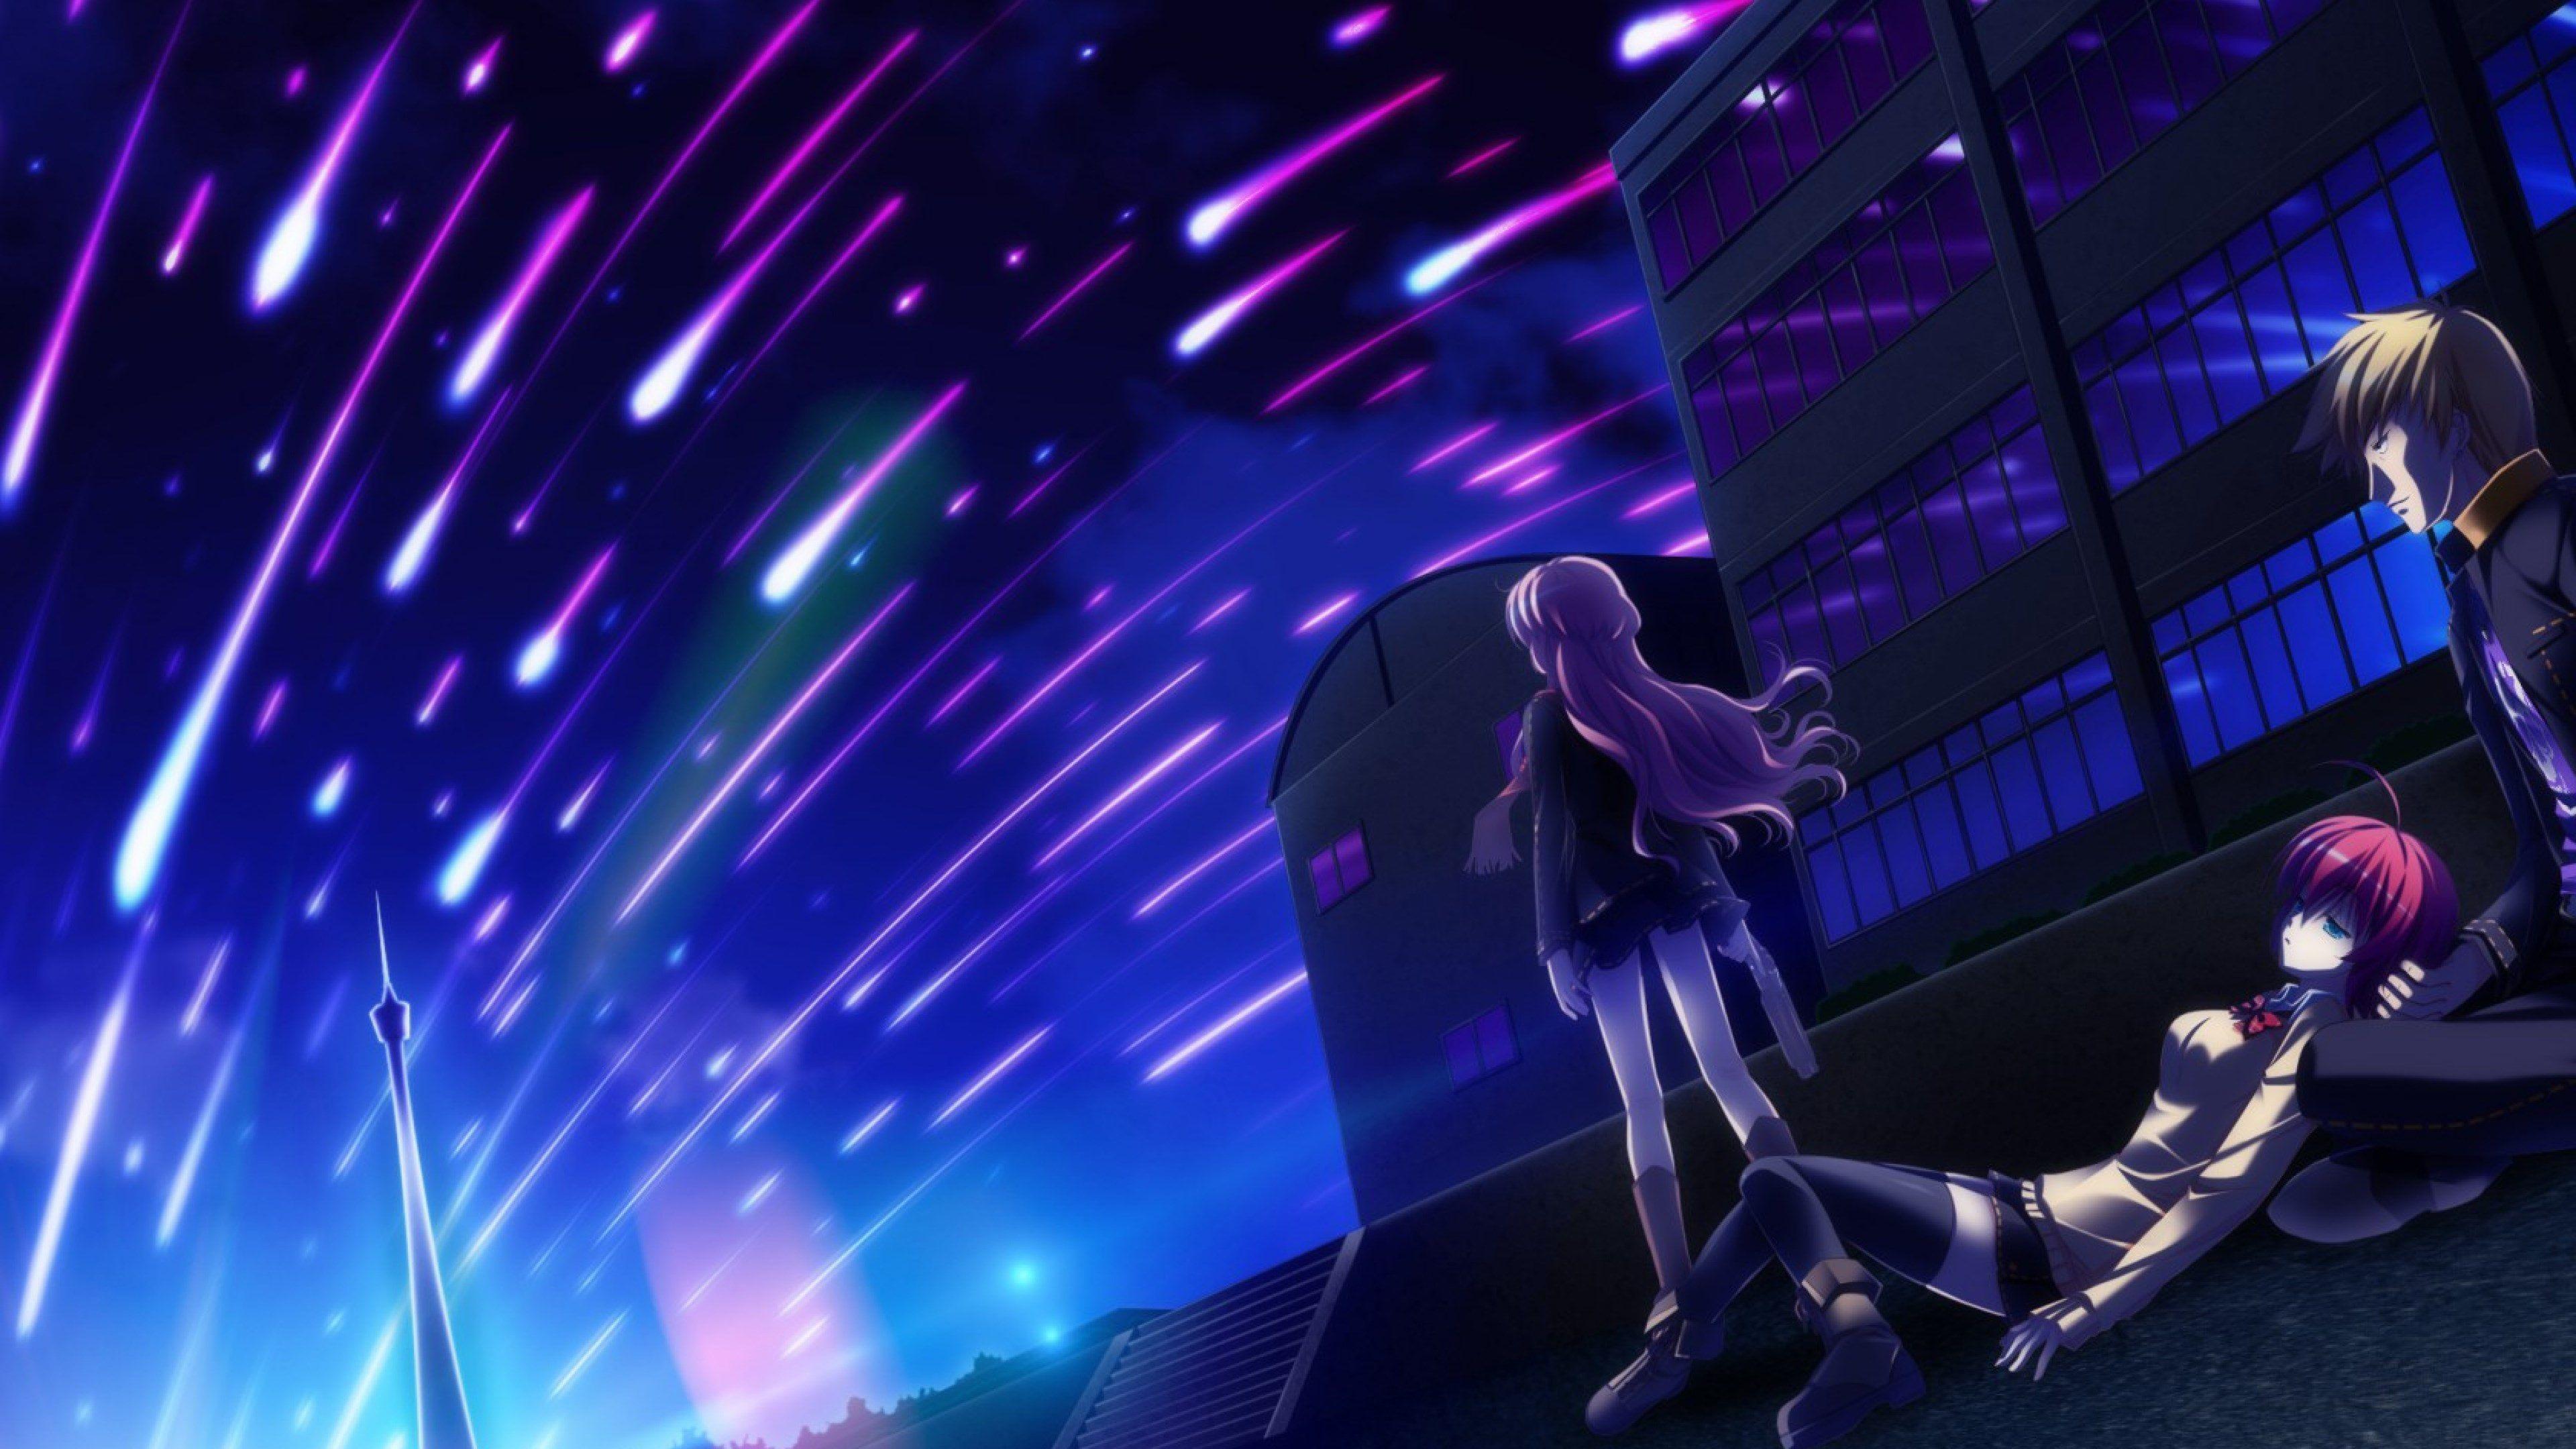 3840x2160 anime 4k nice desktop wallpaper